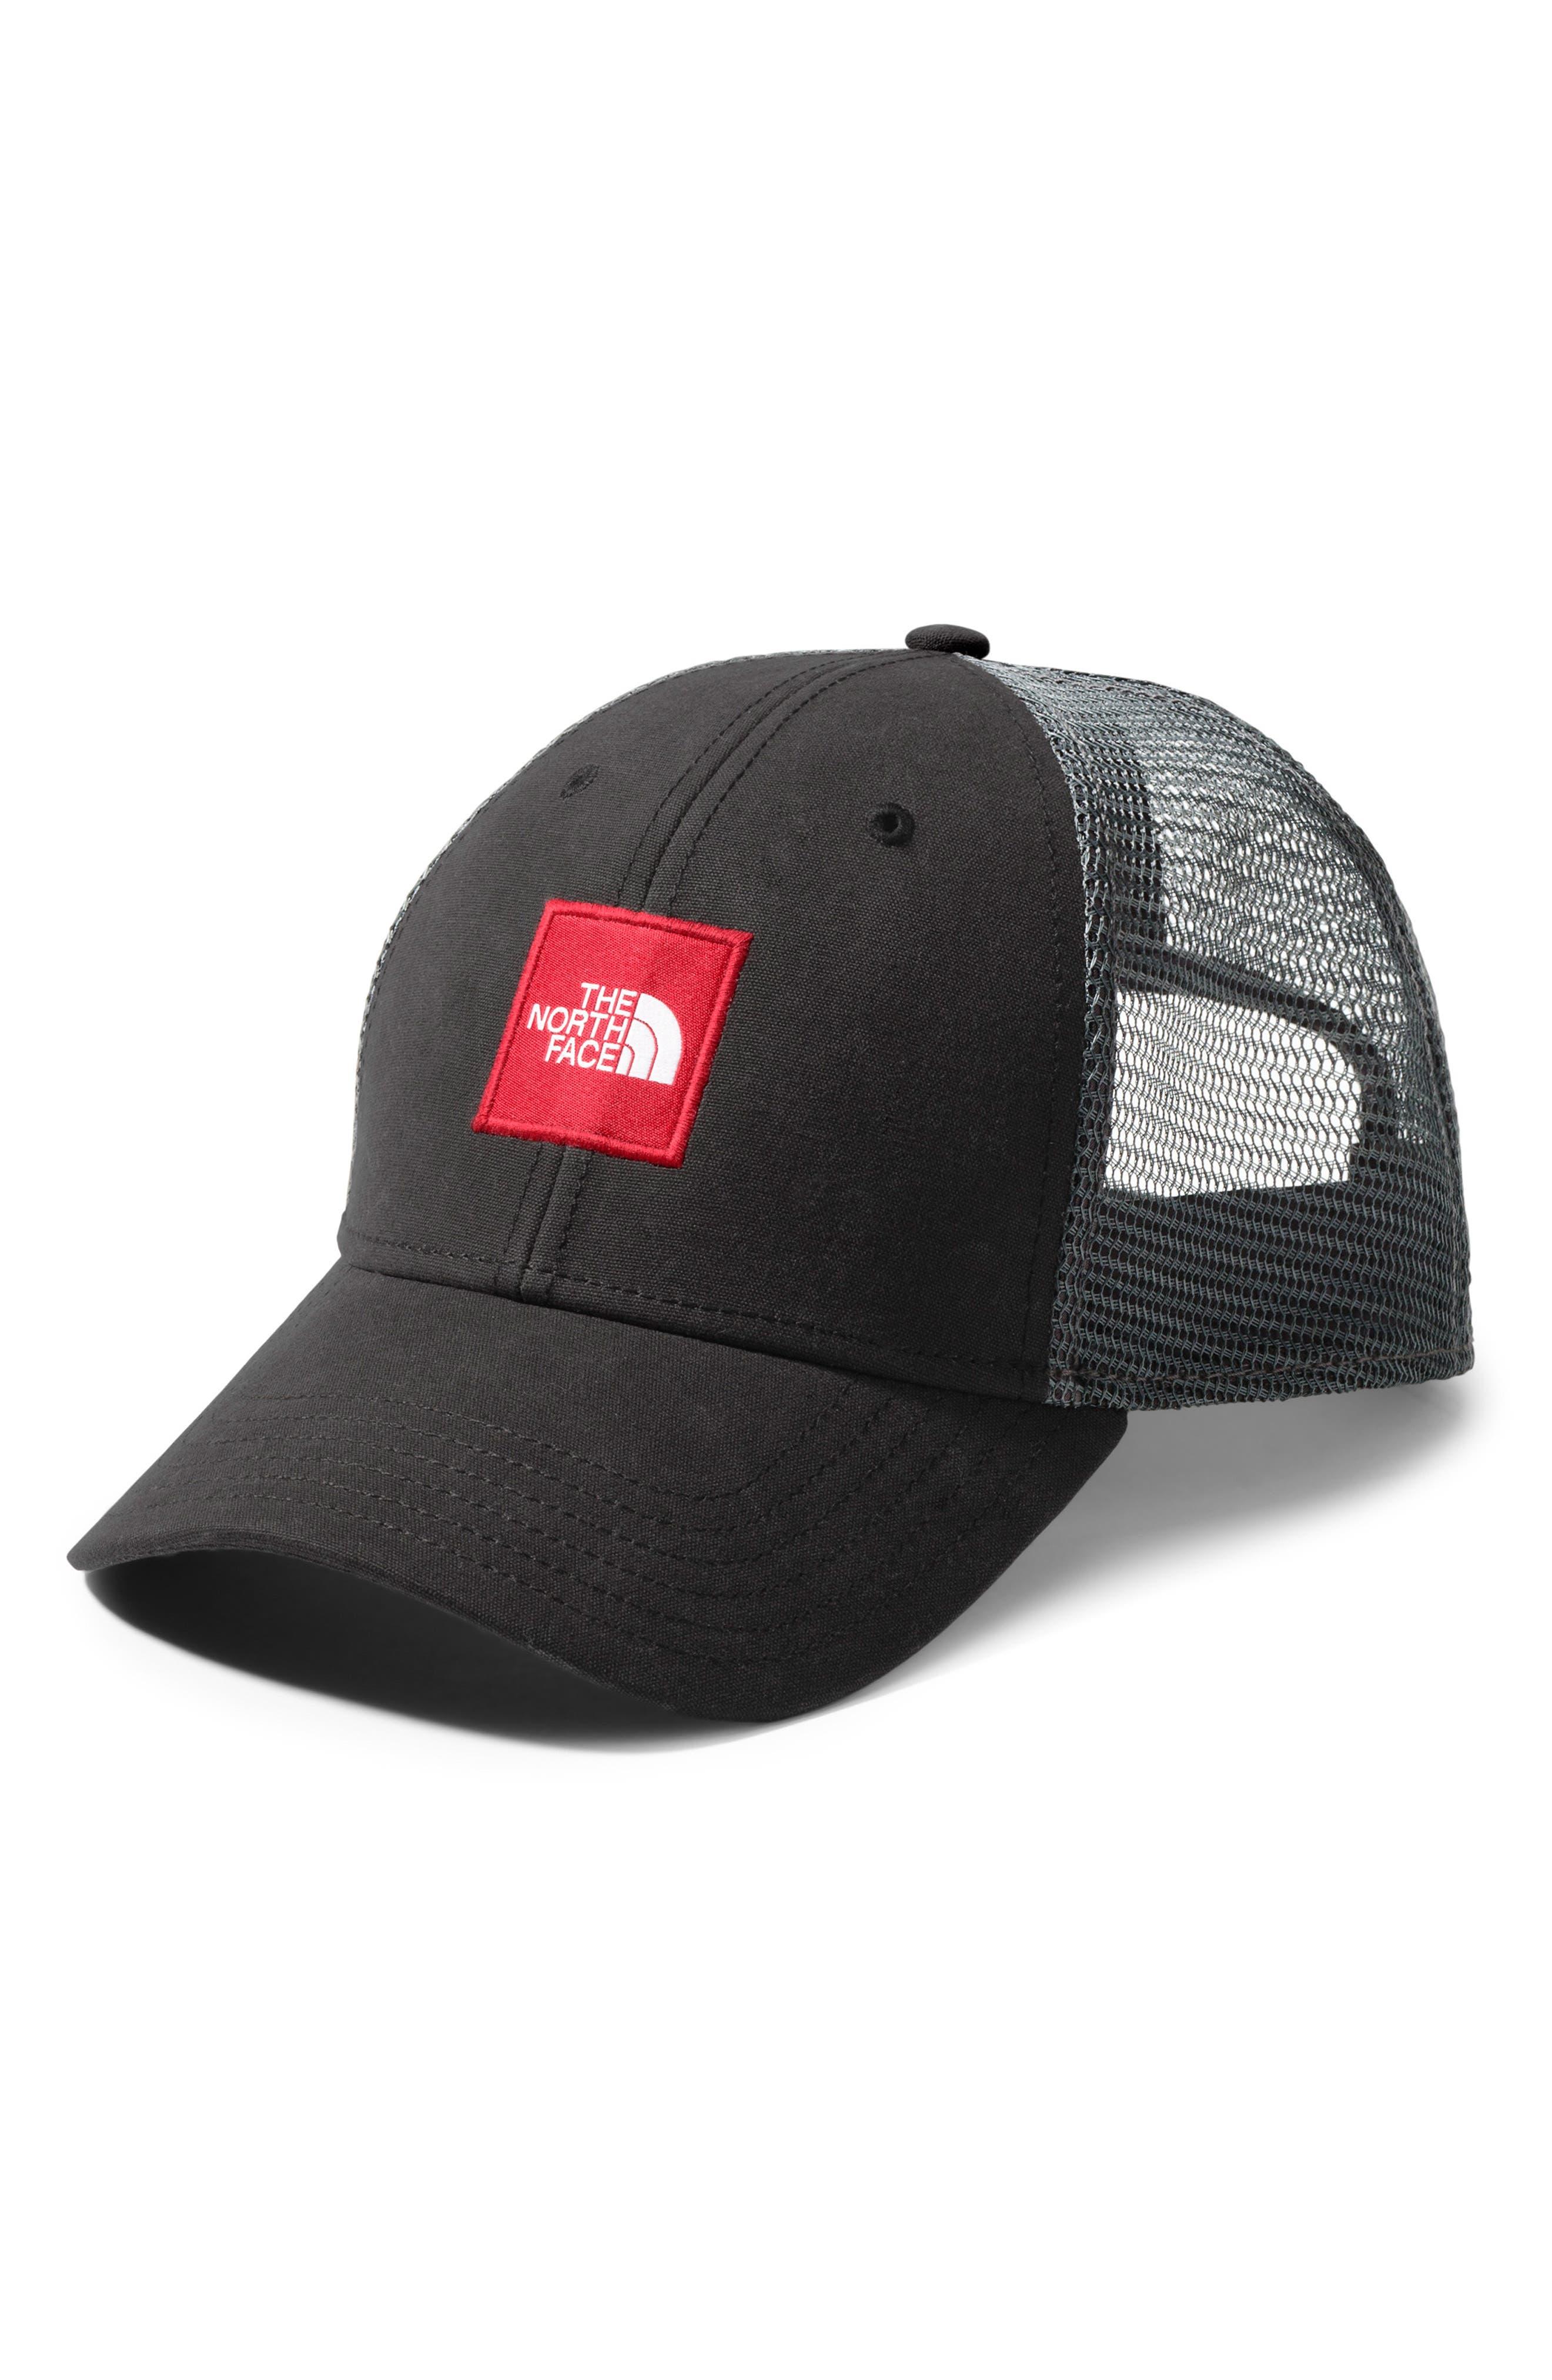 THE NORTH FACE, Box Logo Trucker Hat, Main thumbnail 1, color, TNF BLACK